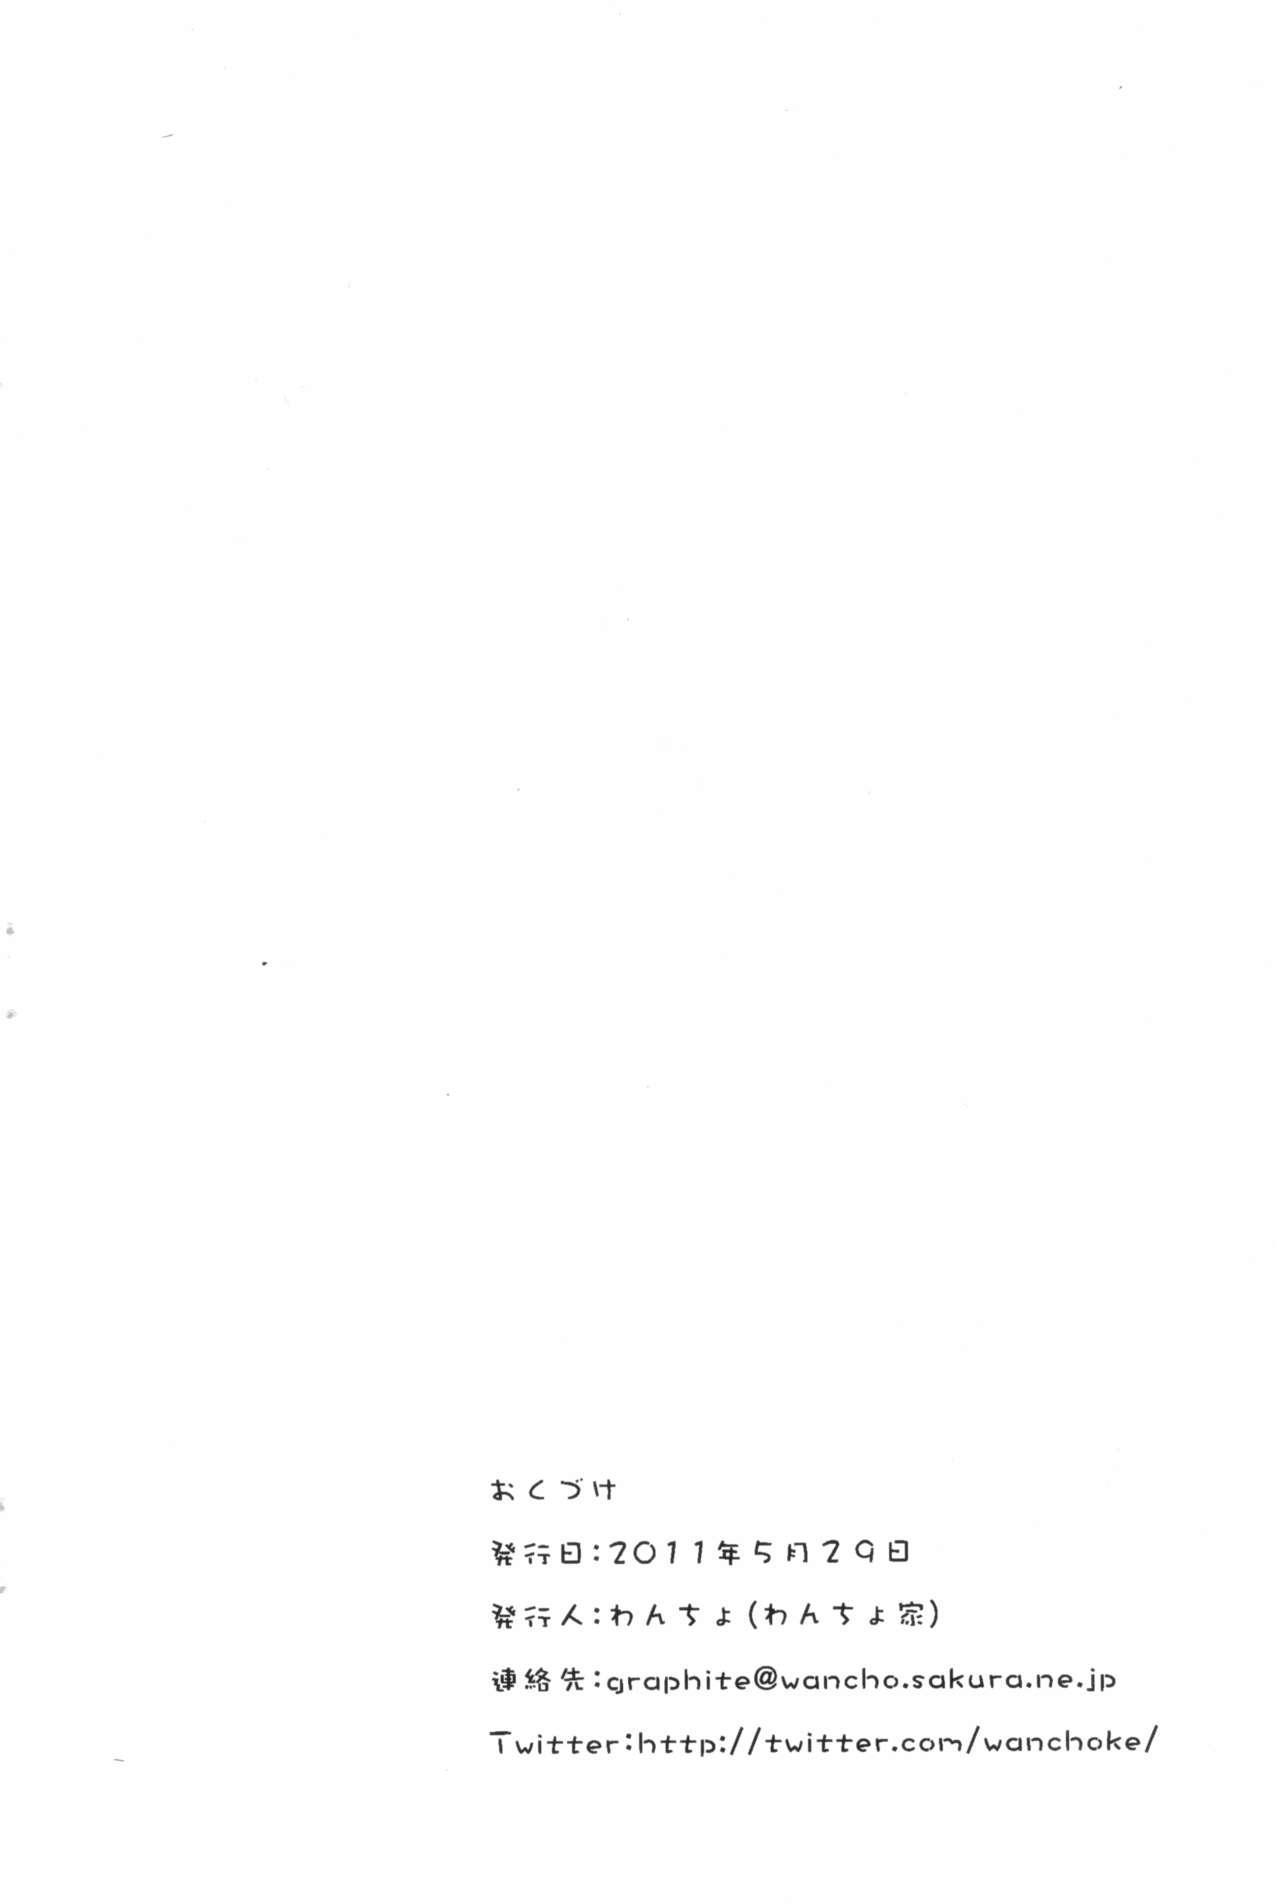 Wancho-ke Note 110529 15